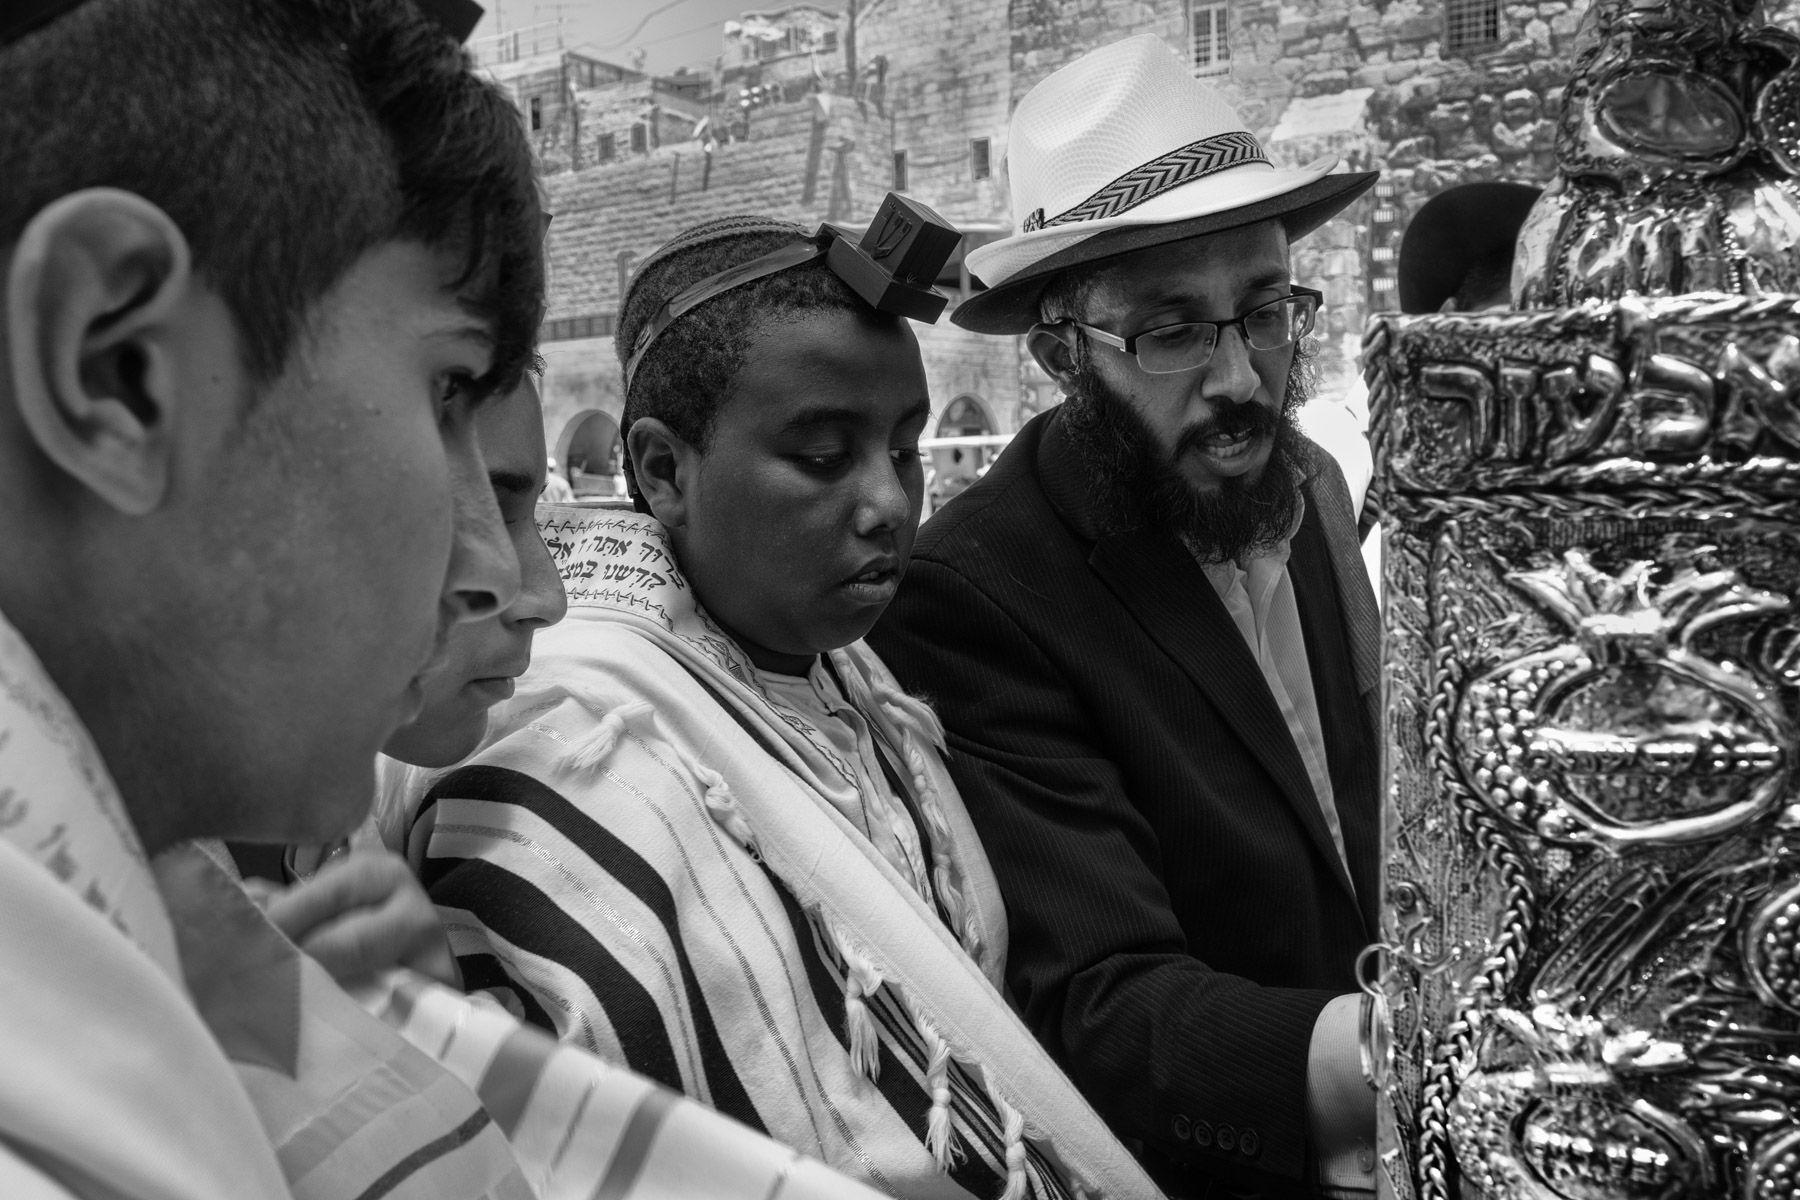 Jerusalem, Israel 06/20/16